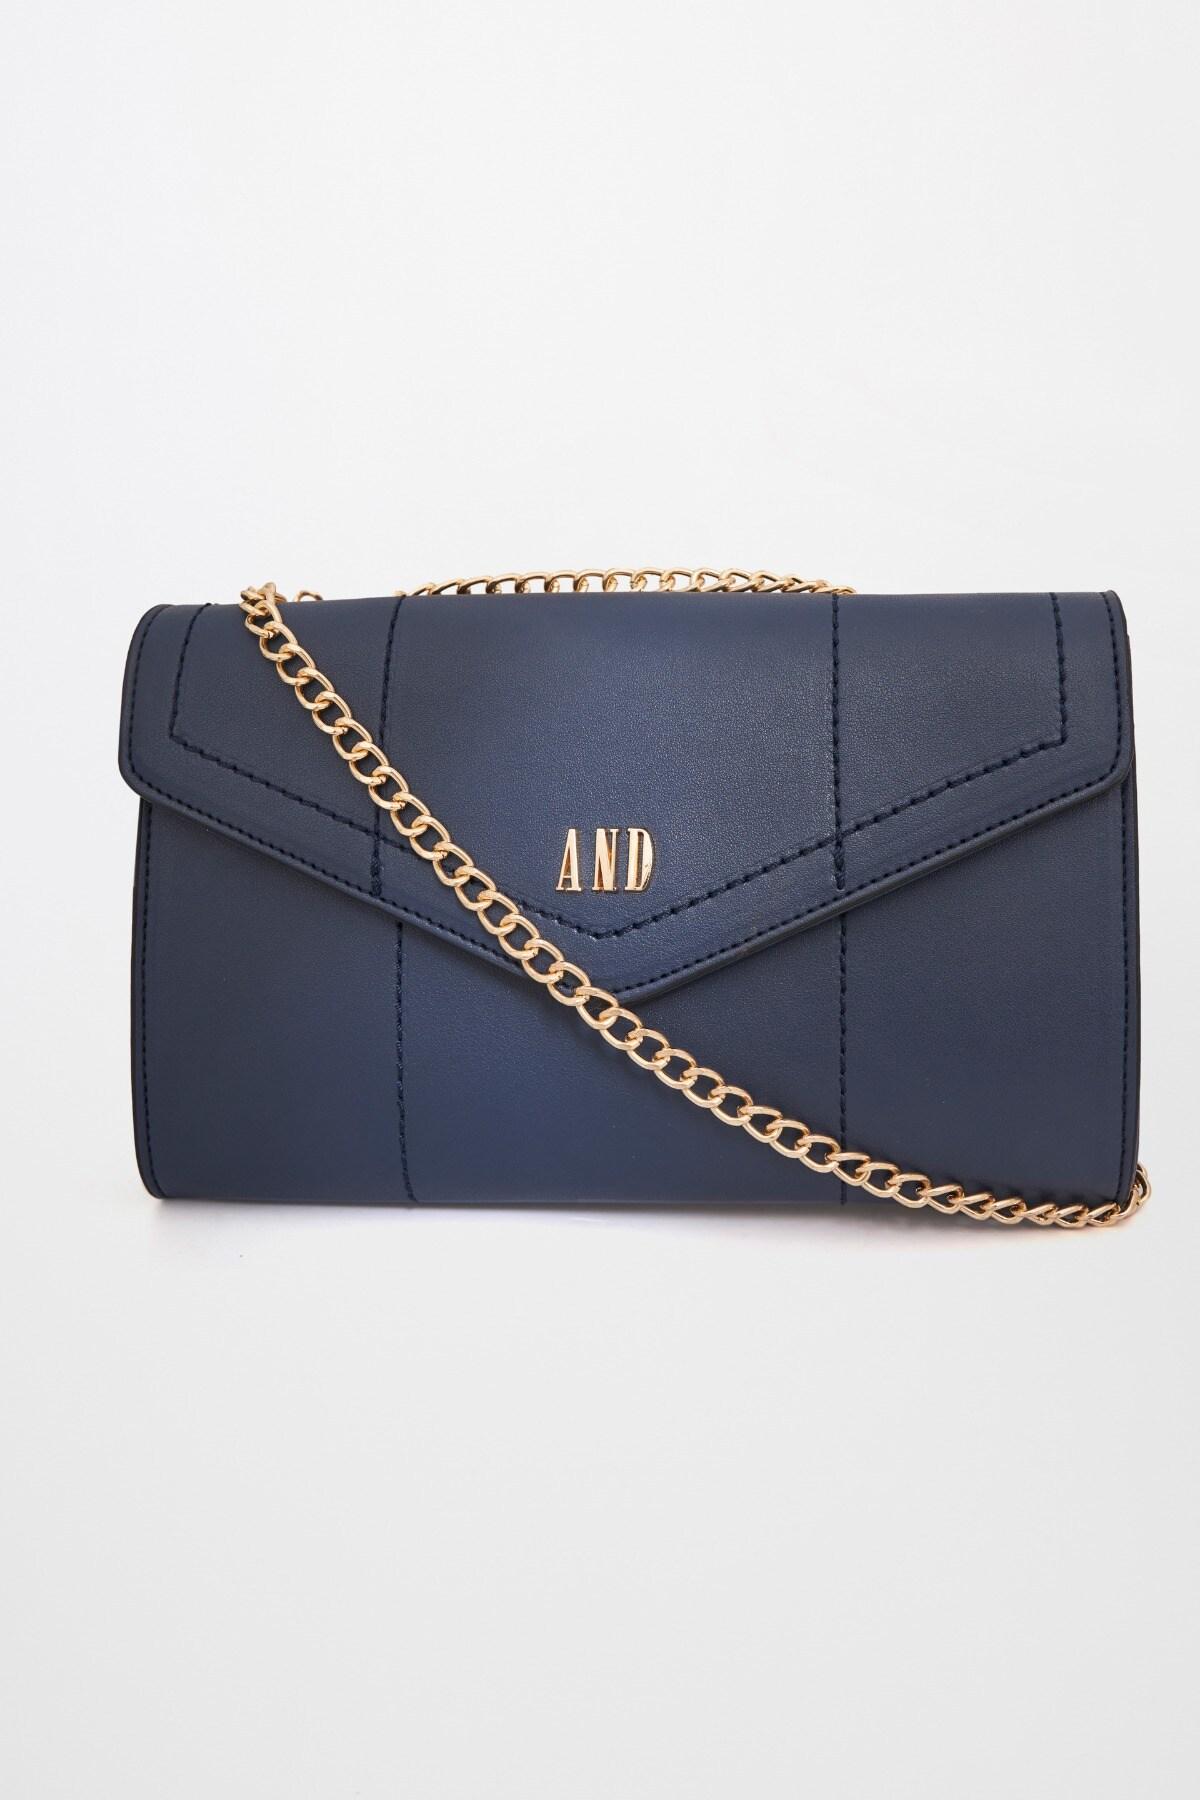 AND | Navy Sling Handbag